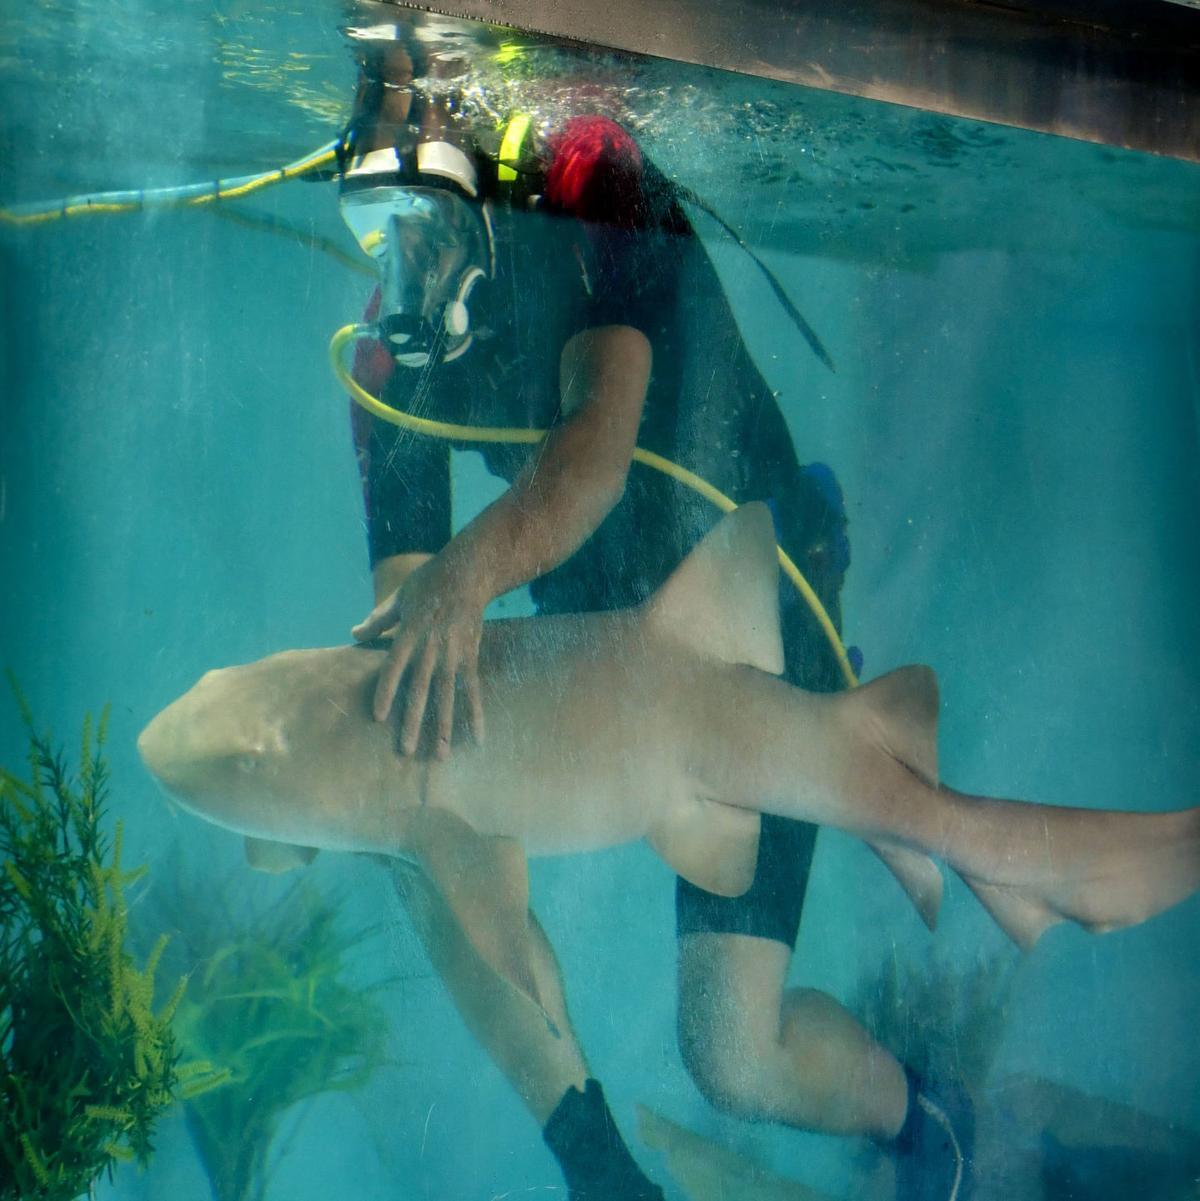 071018 Shark Experience 01.jpg